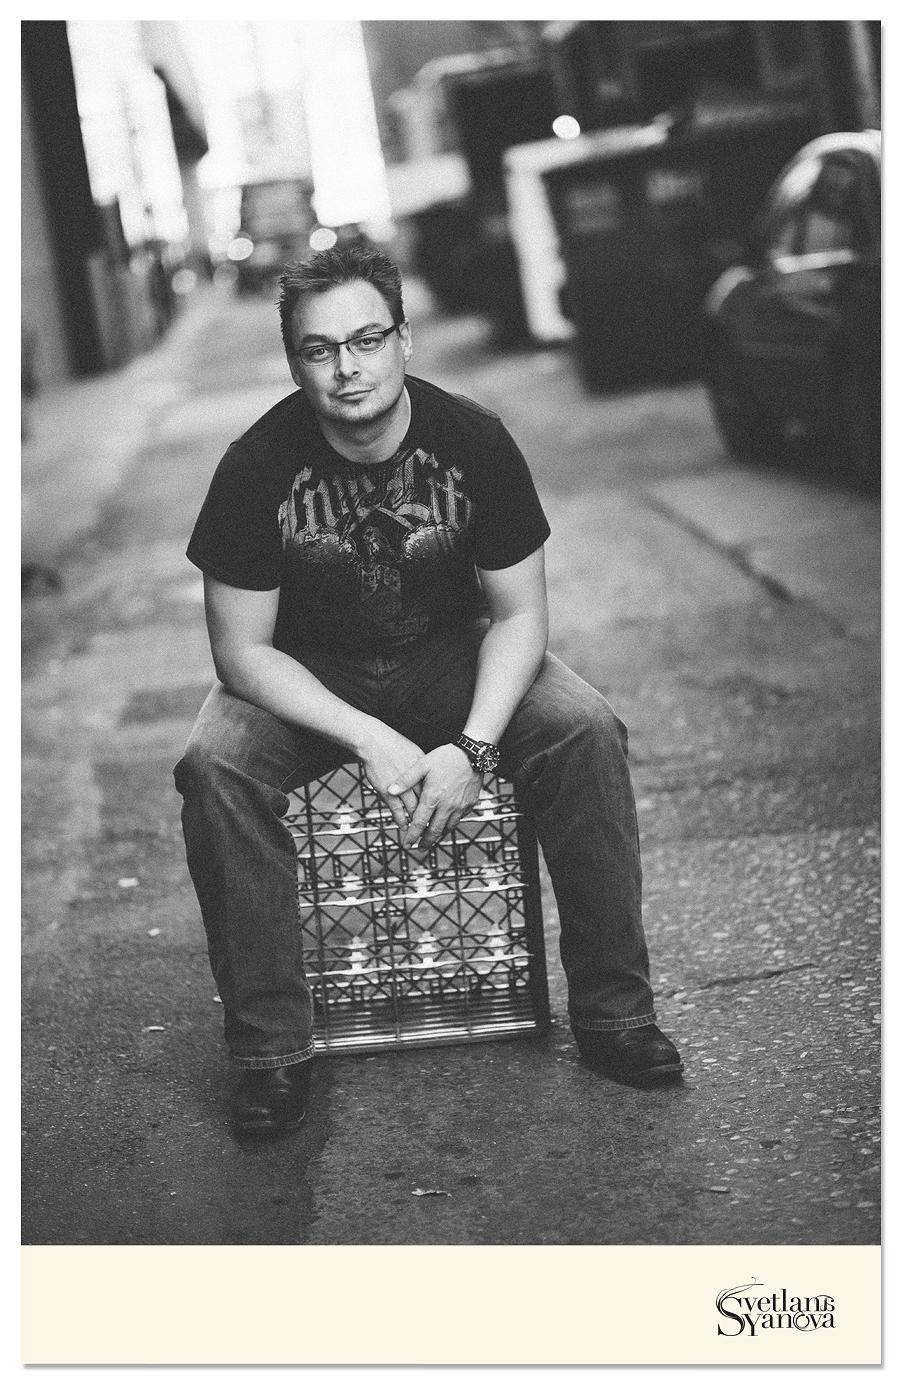 Calgary Portrait photographer, book cover images, business head shots calgary 5